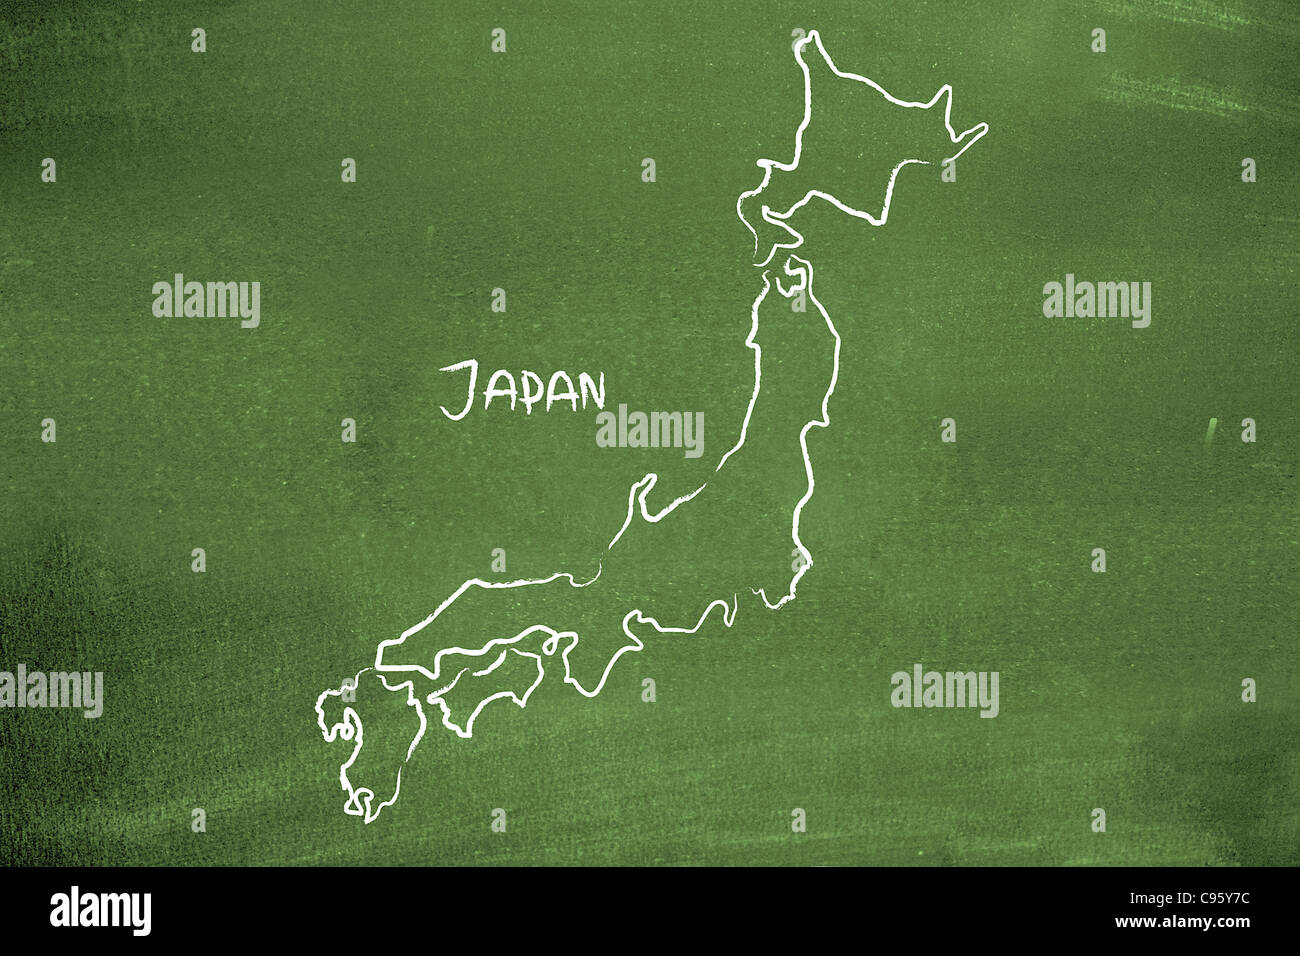 Japan - Stock Image